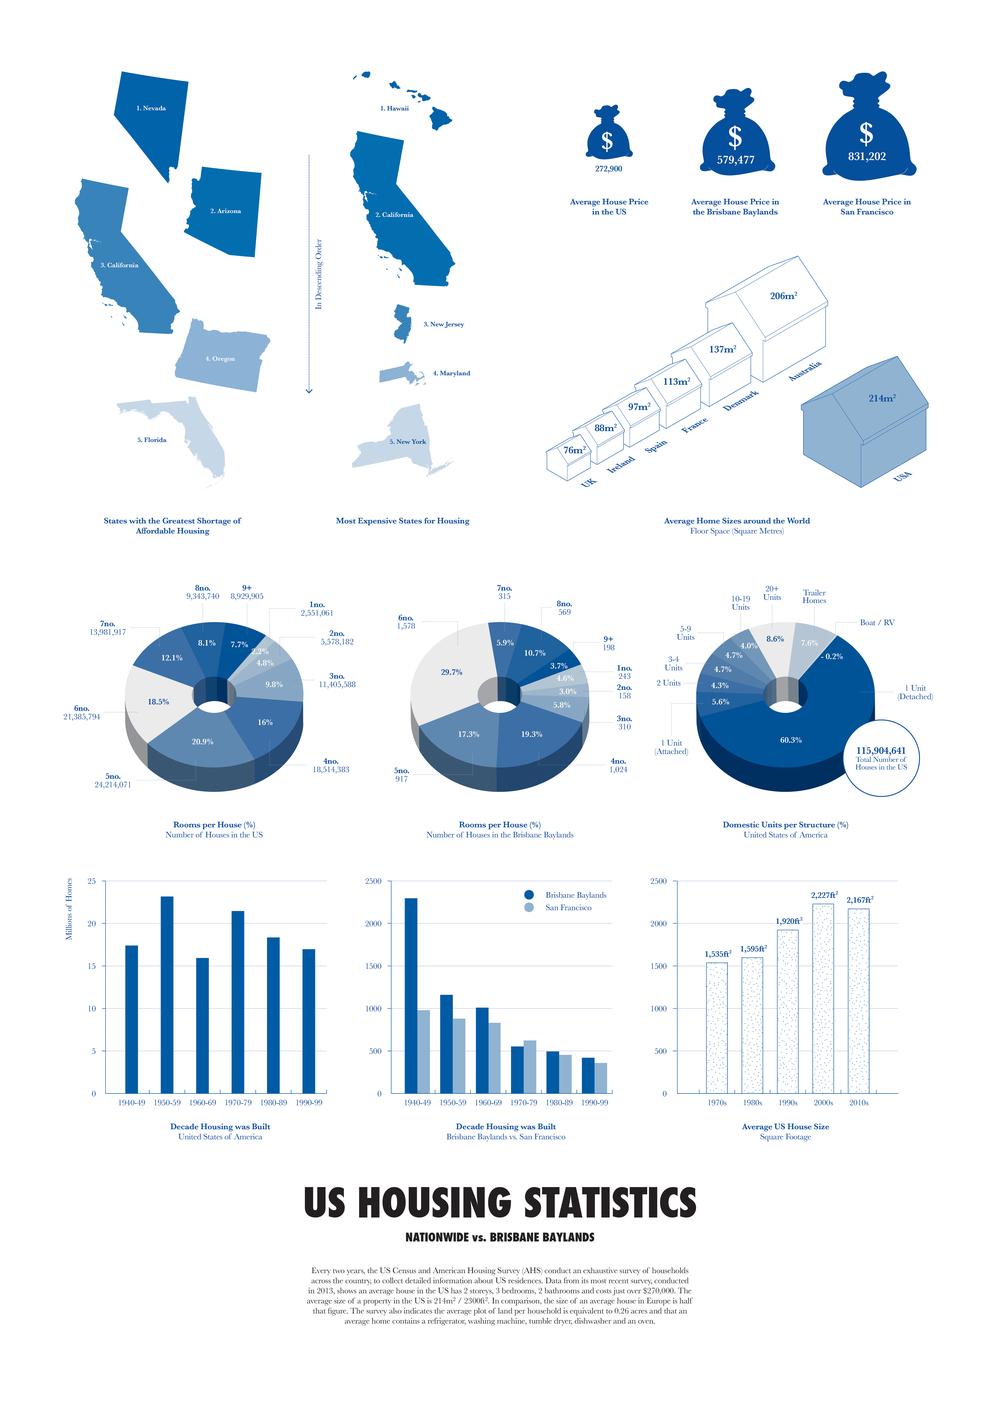 08 US HOUSING STATISTICS.jpg